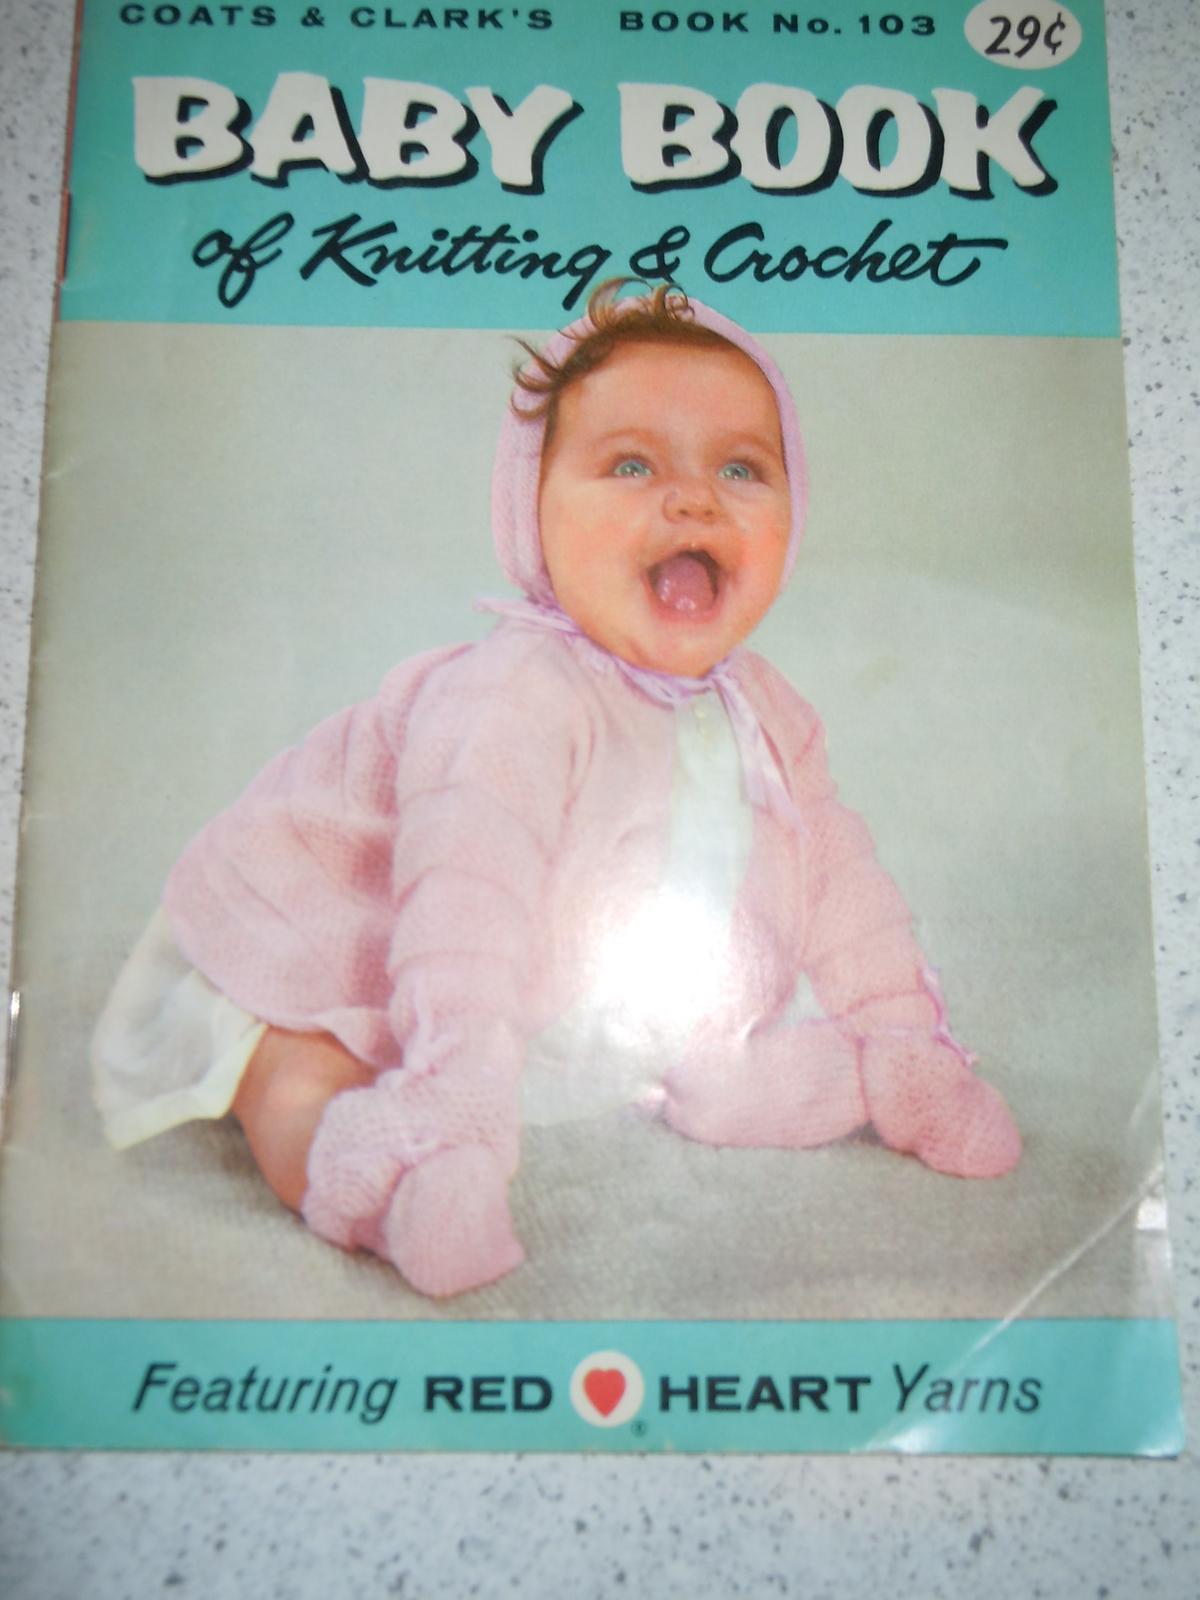 Coats & Clark's Baby Book of Knitting & Crochet Book No. 103 1958 - $5.99